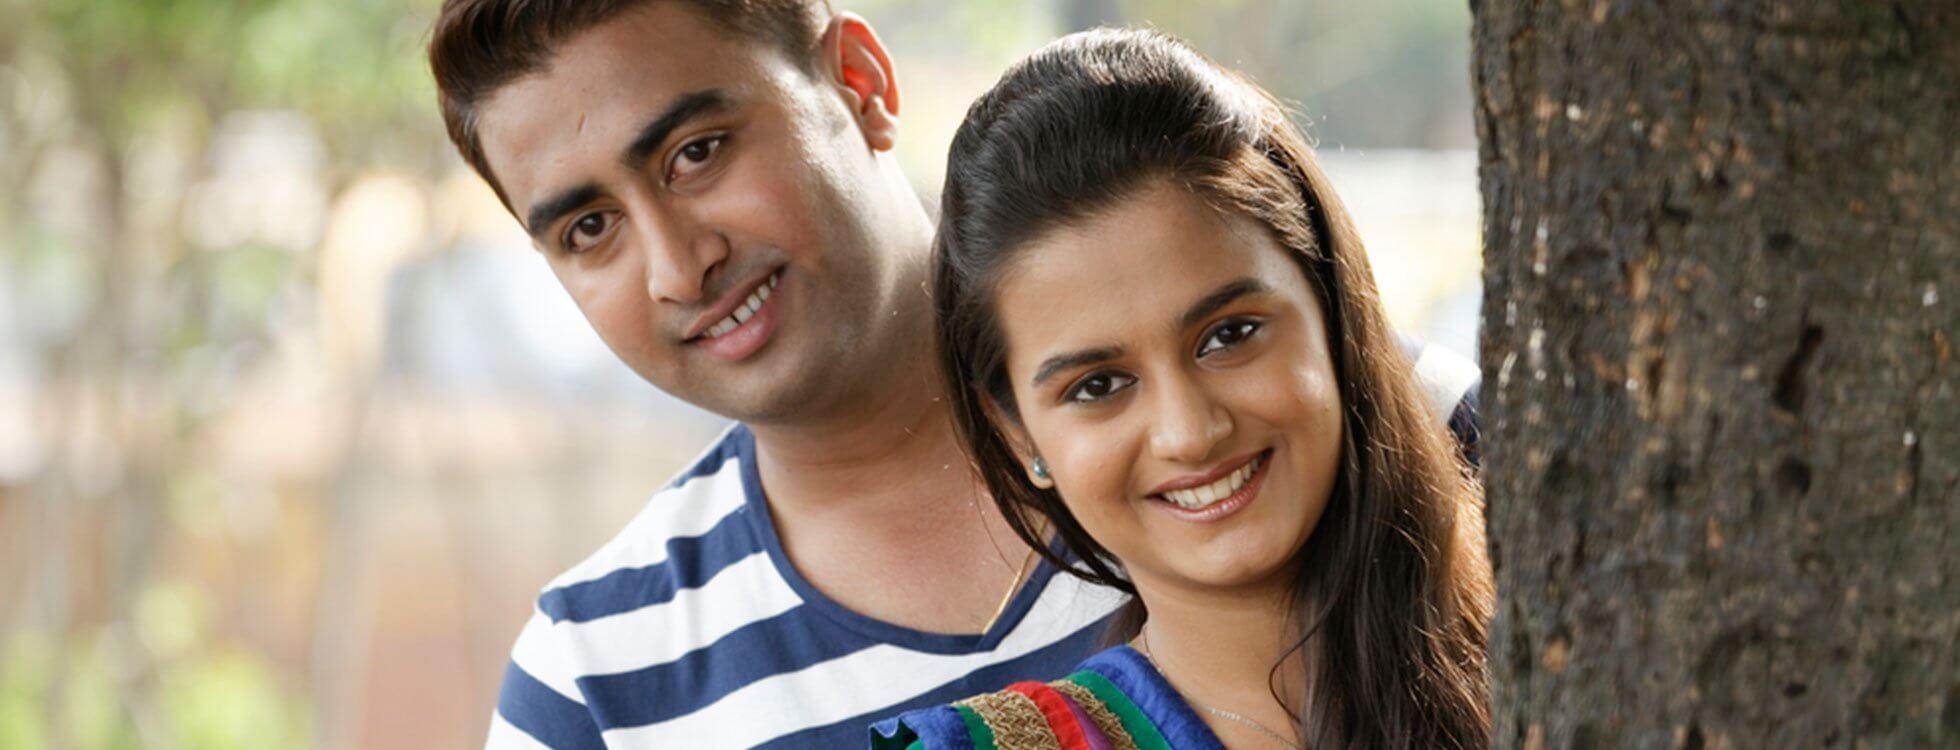 Marathi Matrimony - मराठी विवाह - No Fees